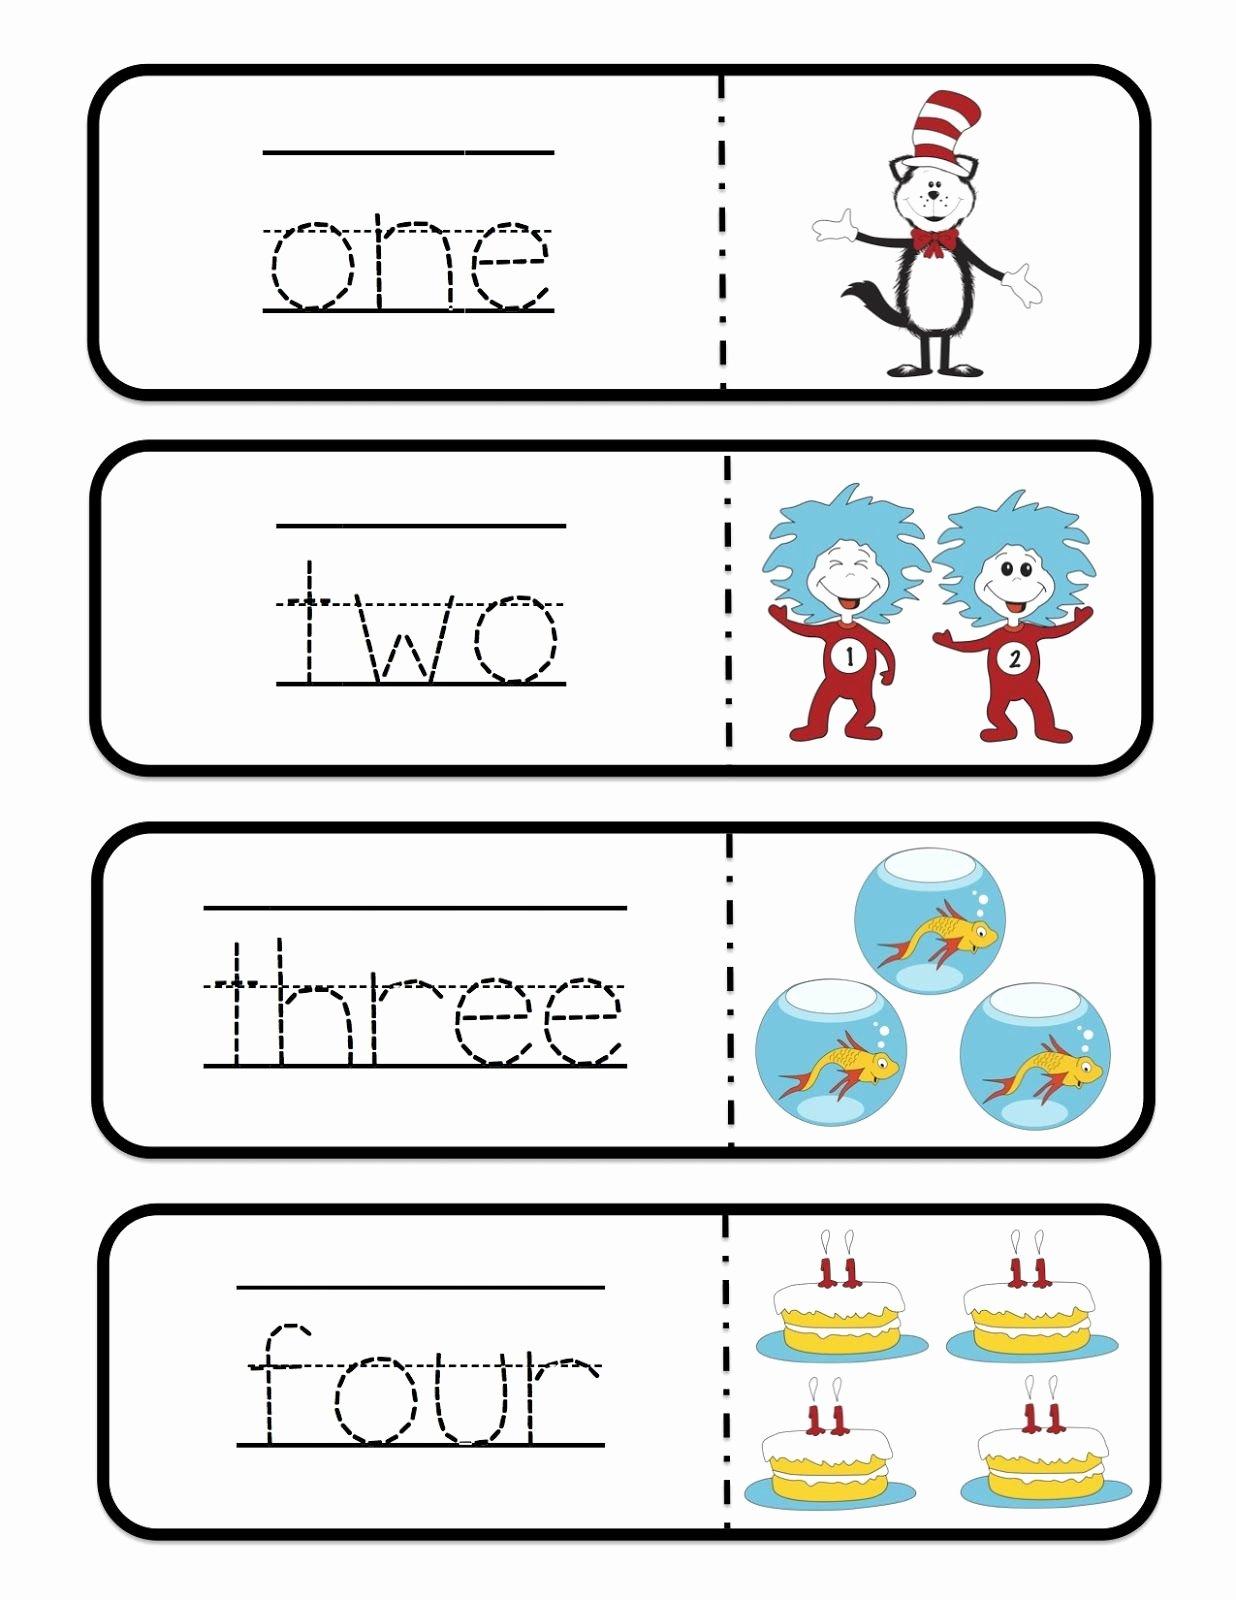 Dr Seuss Worksheets For Preschoolers